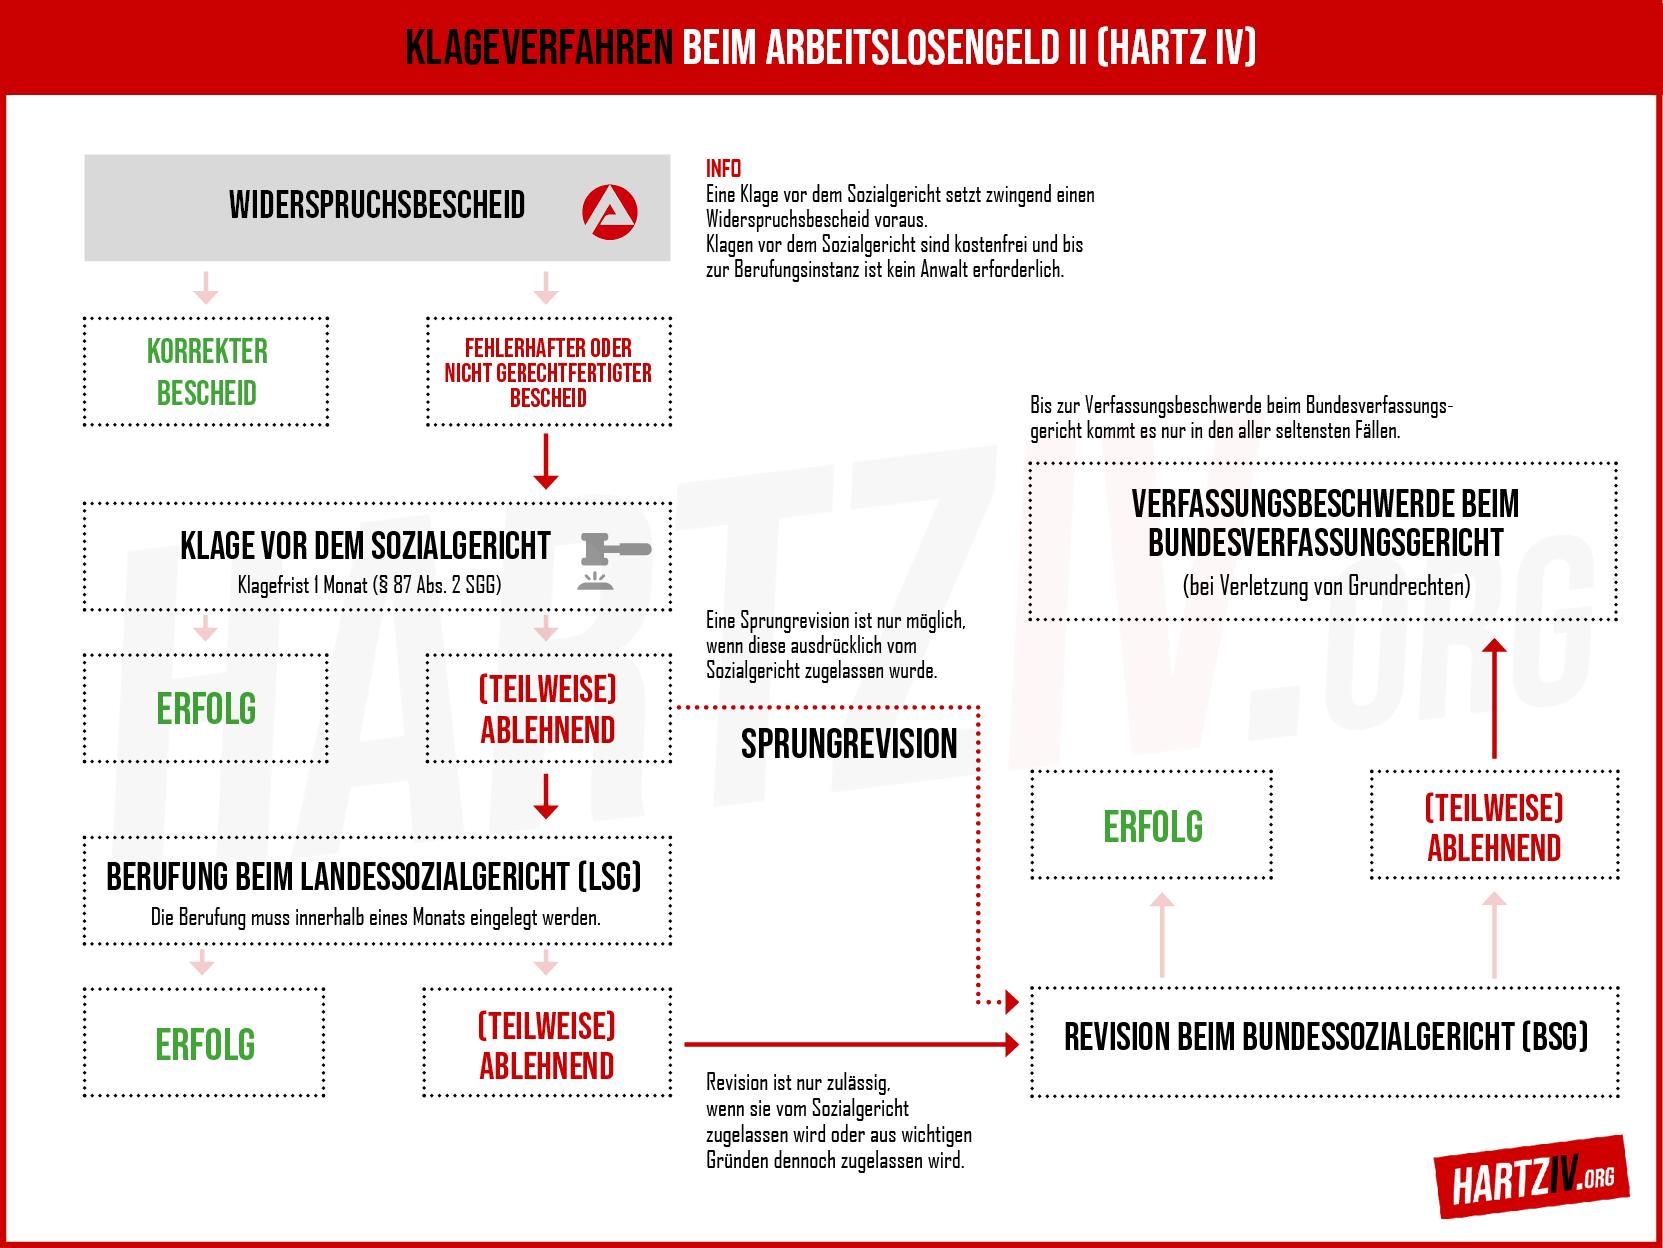 Hartz Iv Klage Gegen Jobcenter Bescheid